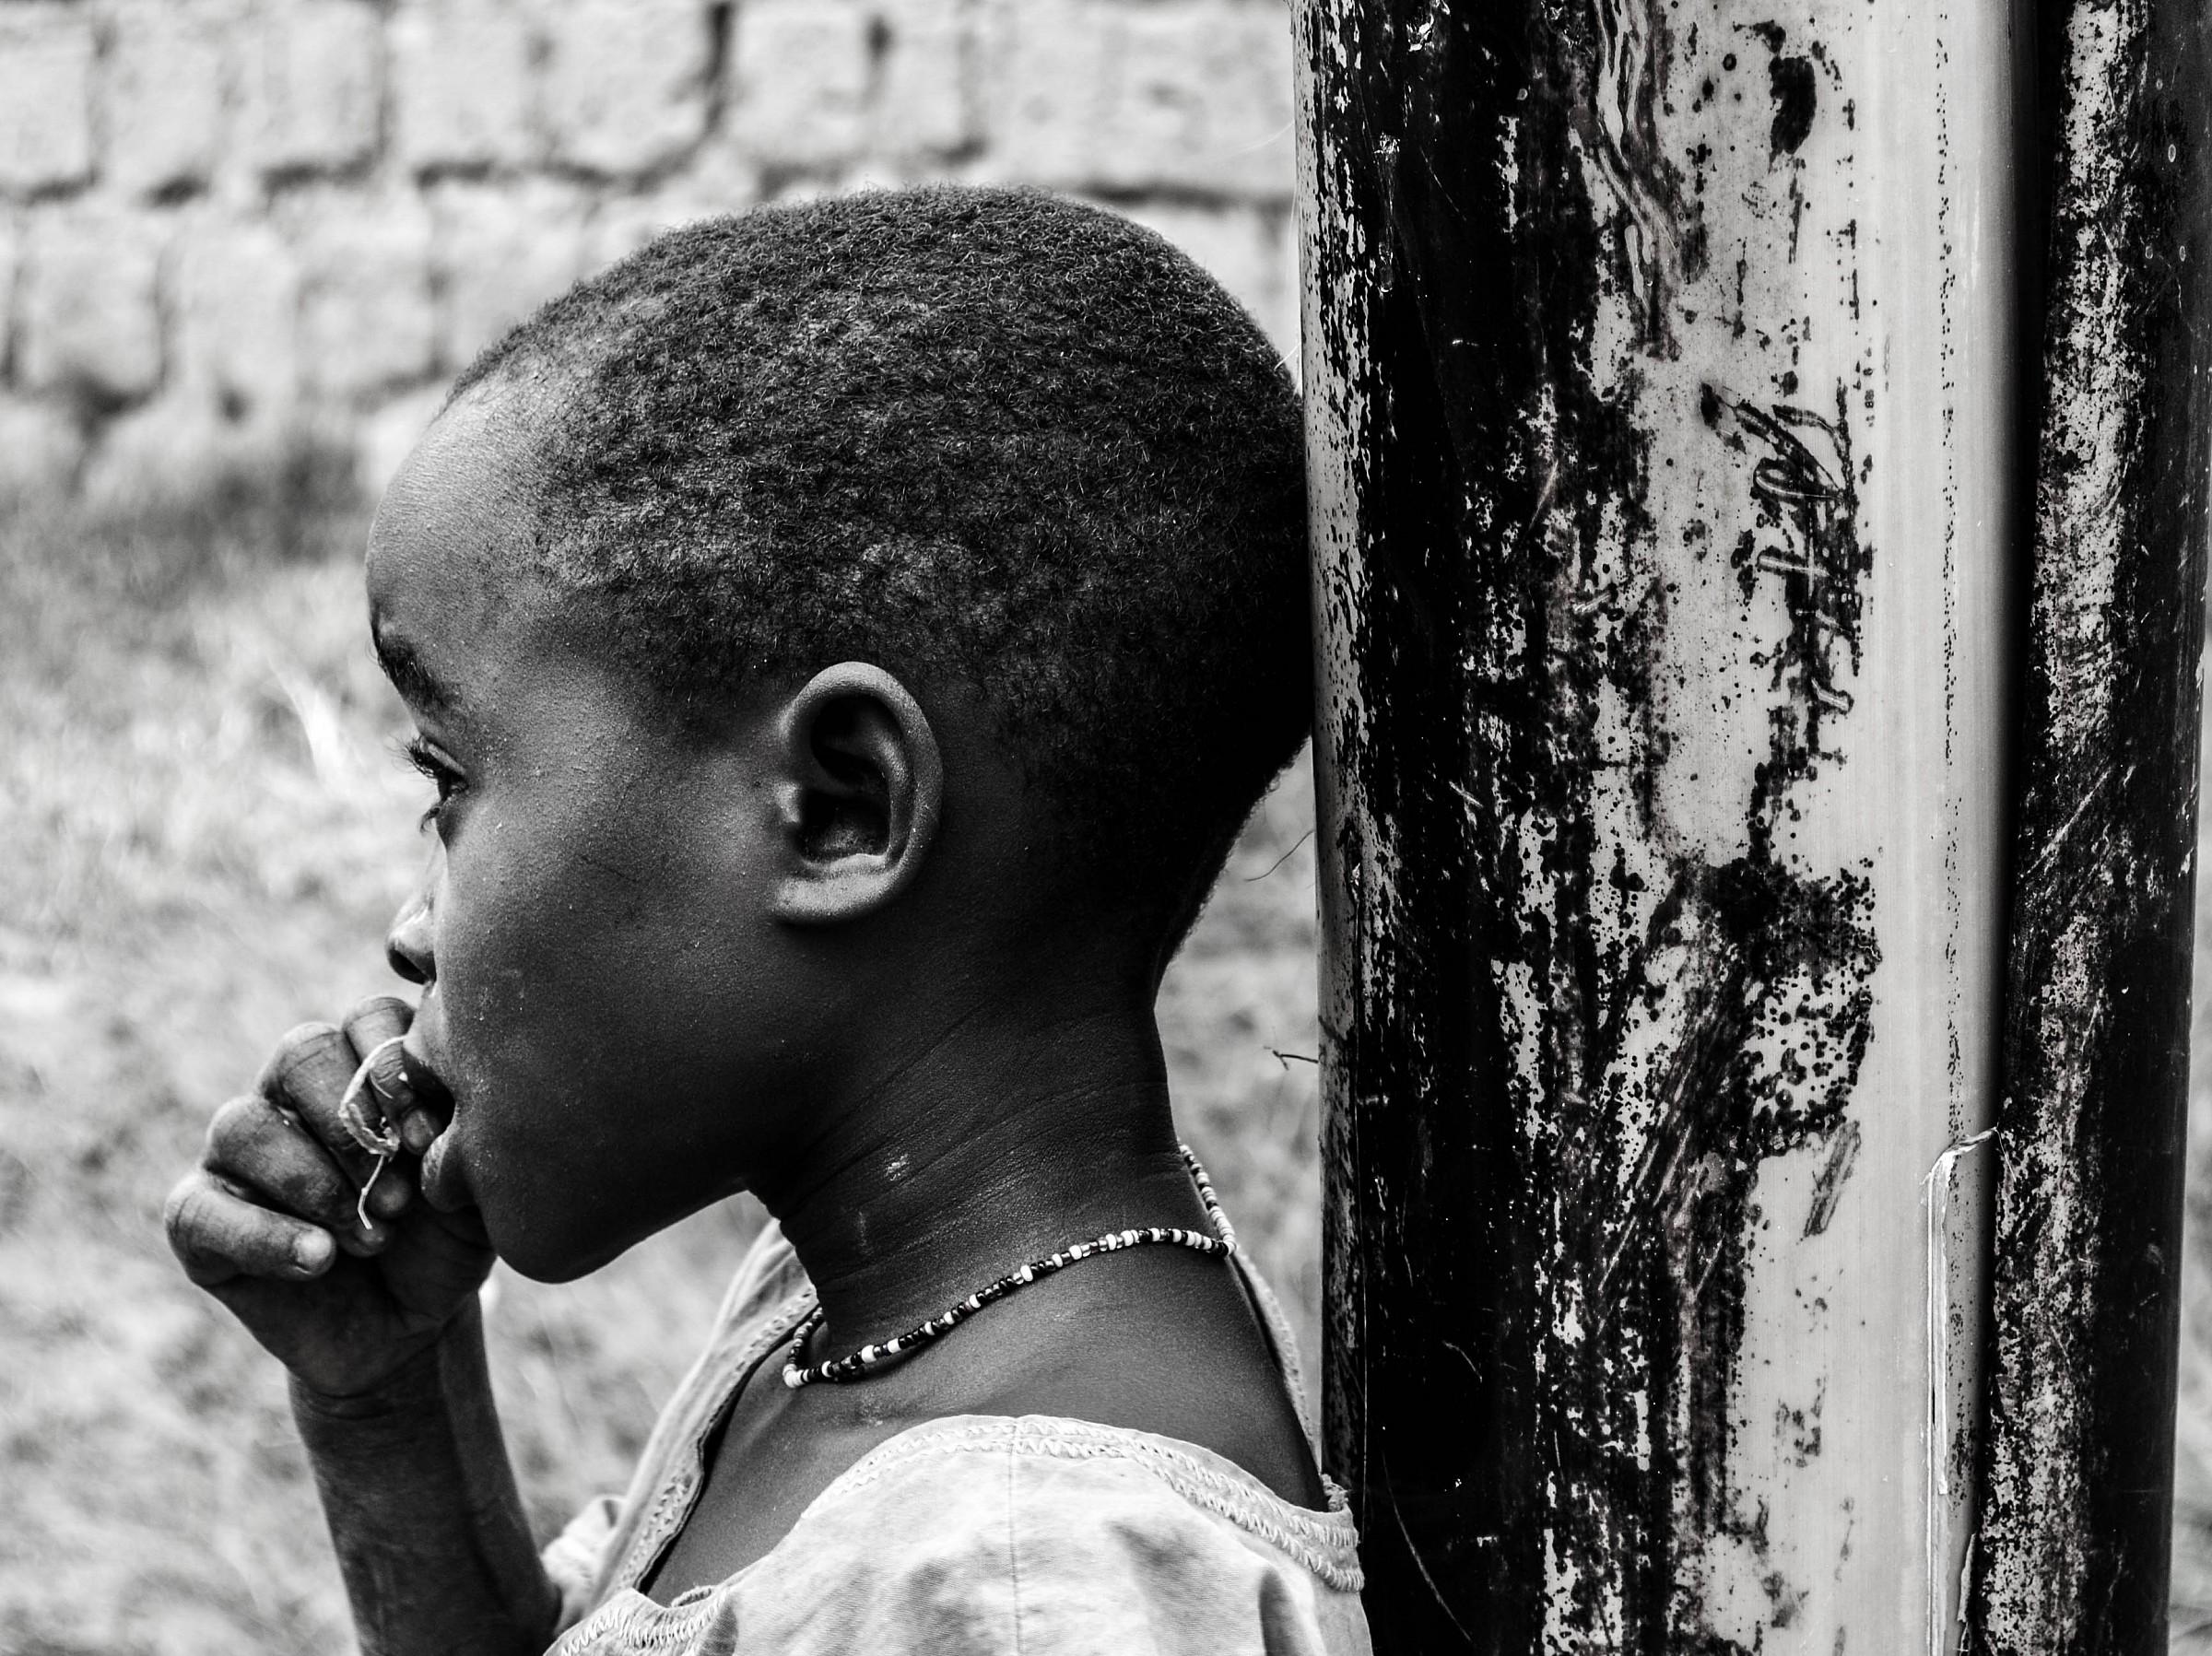 Ragazza rwandese...